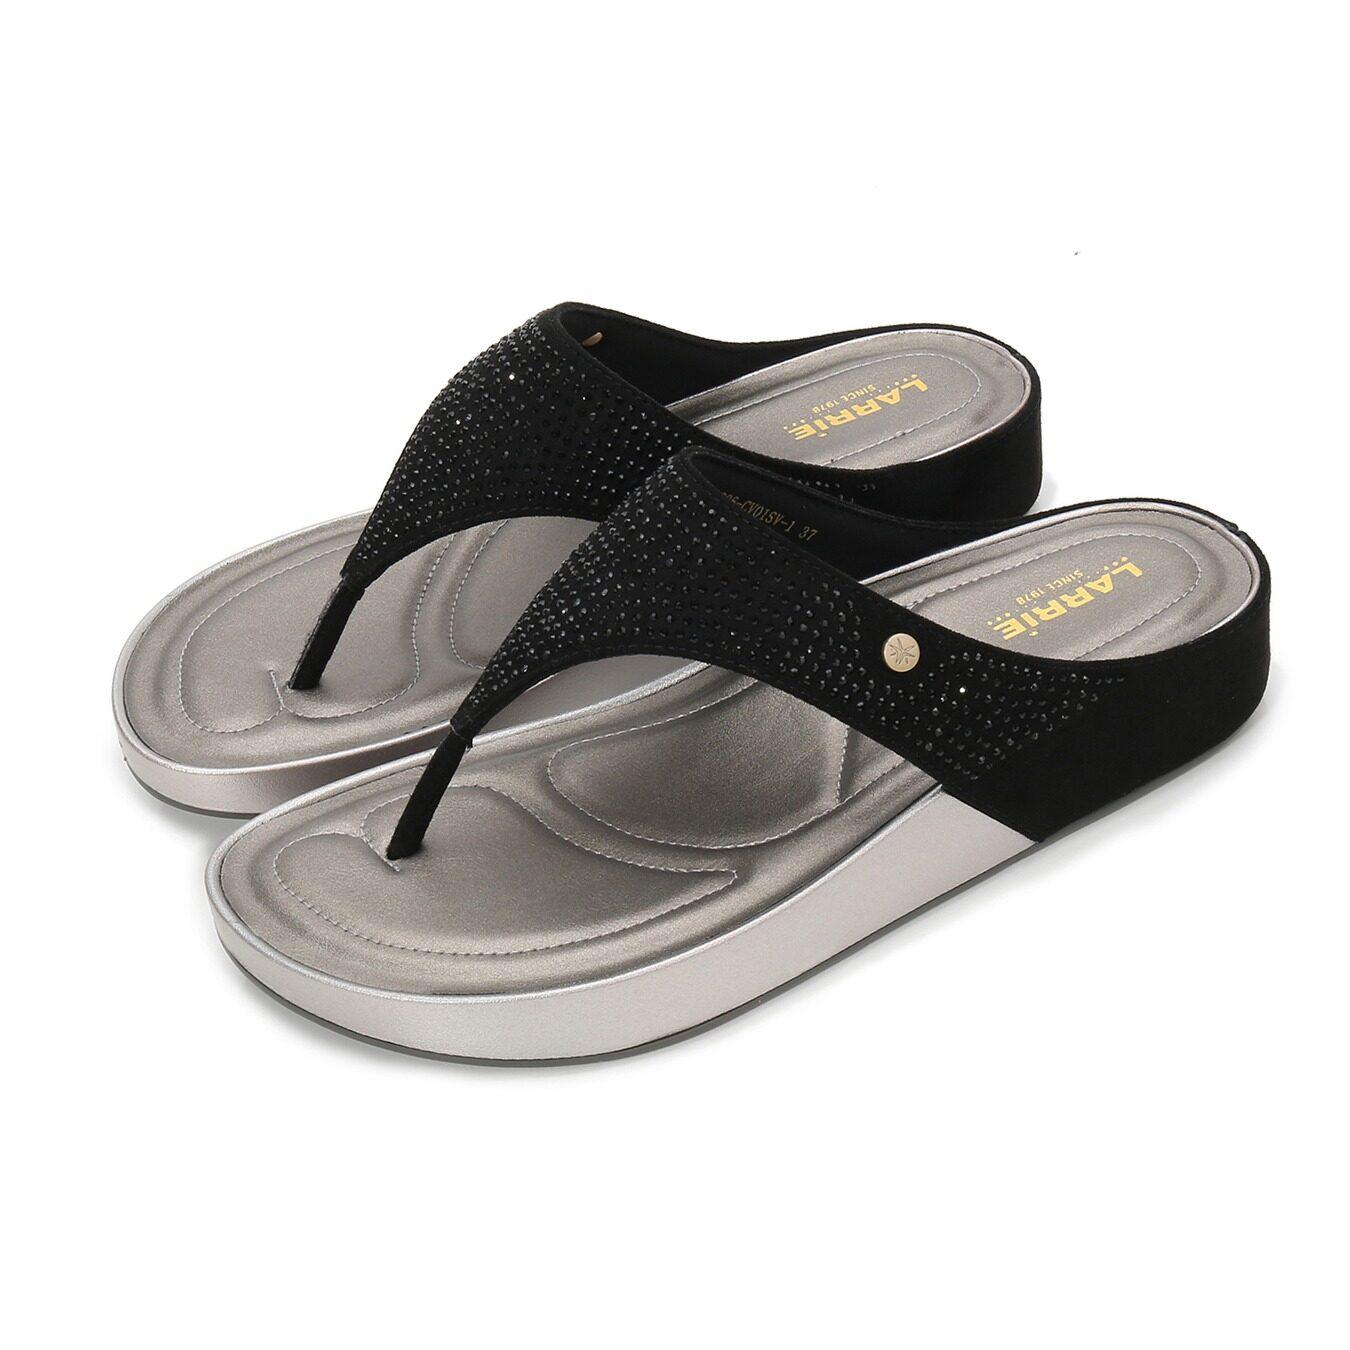 LARRIE Kasut Perempuan Glossy Enjoyable Fashion Sandals Women - L91906-CV01SV